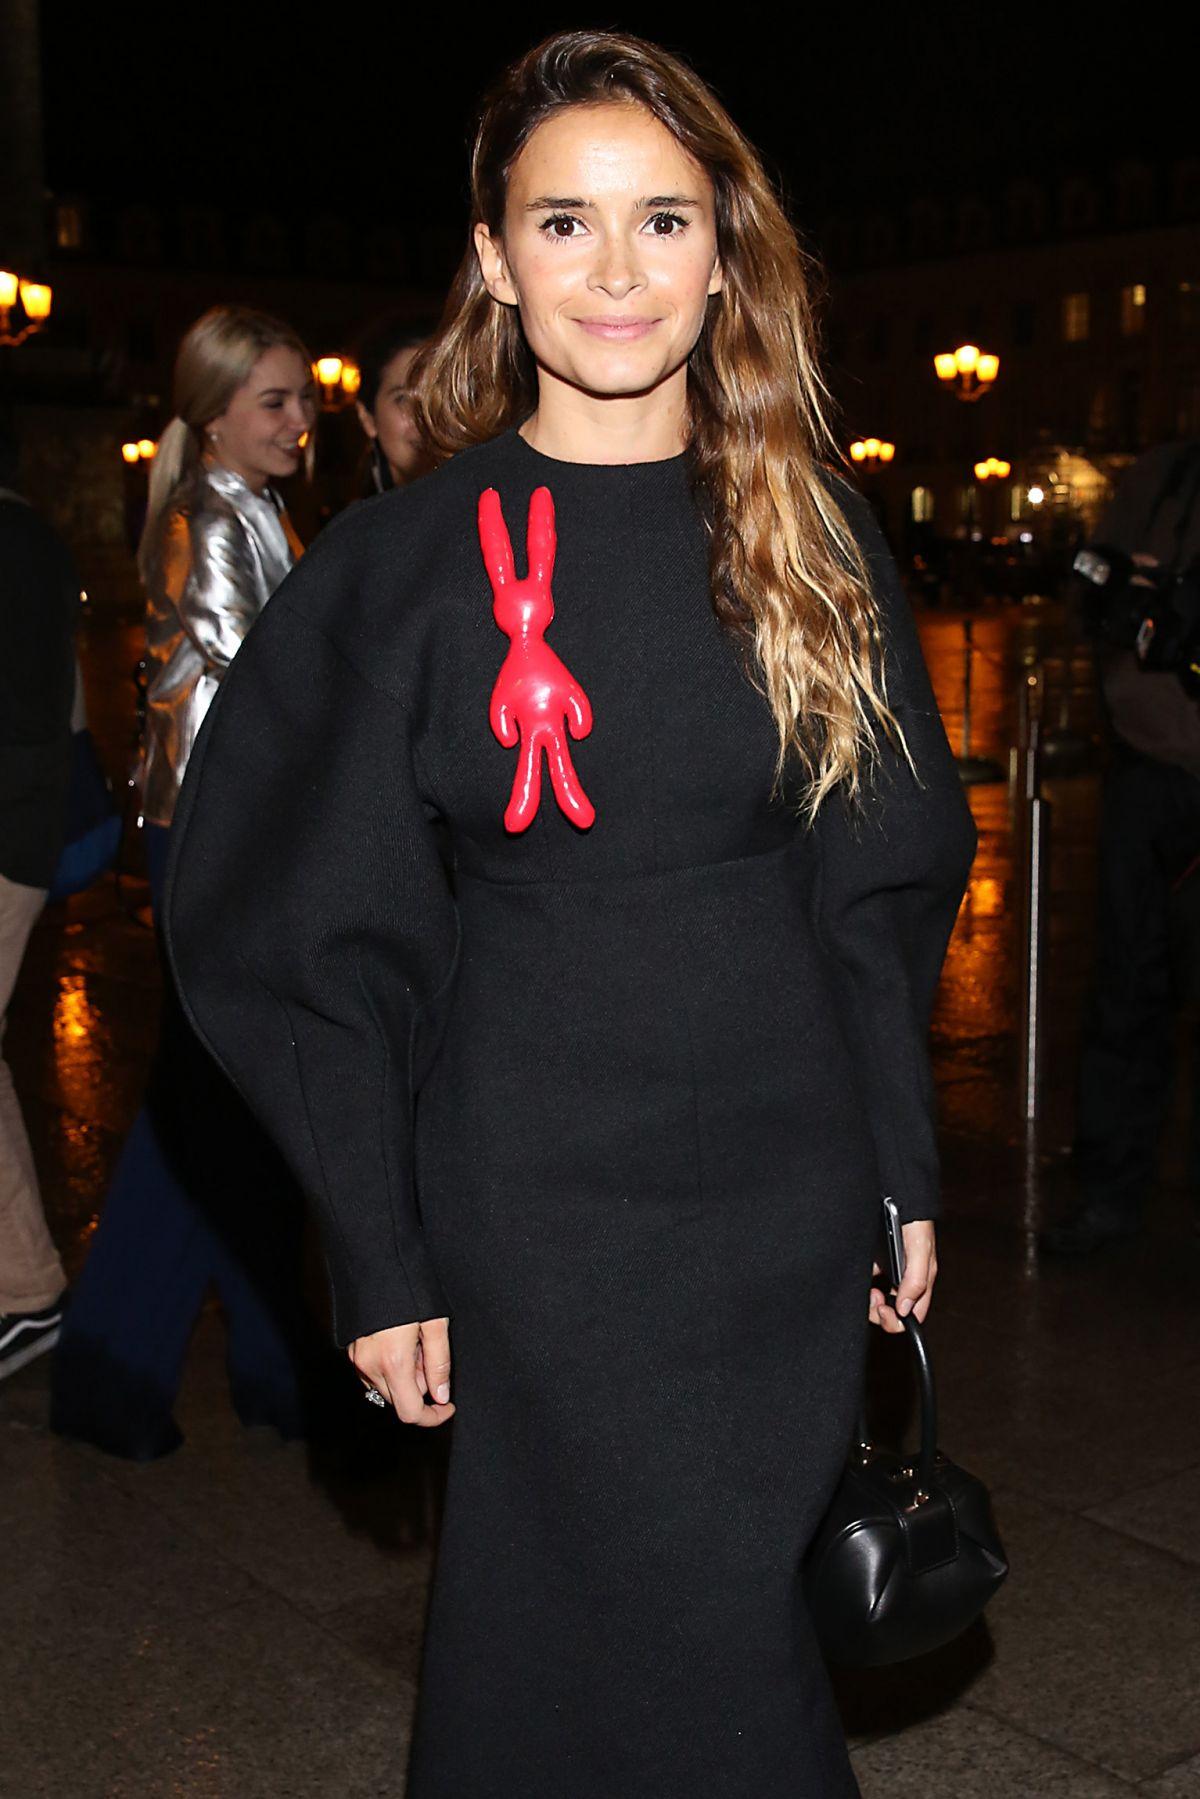 MIROSLAVA DUMA at Ritz Hotel in Paris 09/30/2016